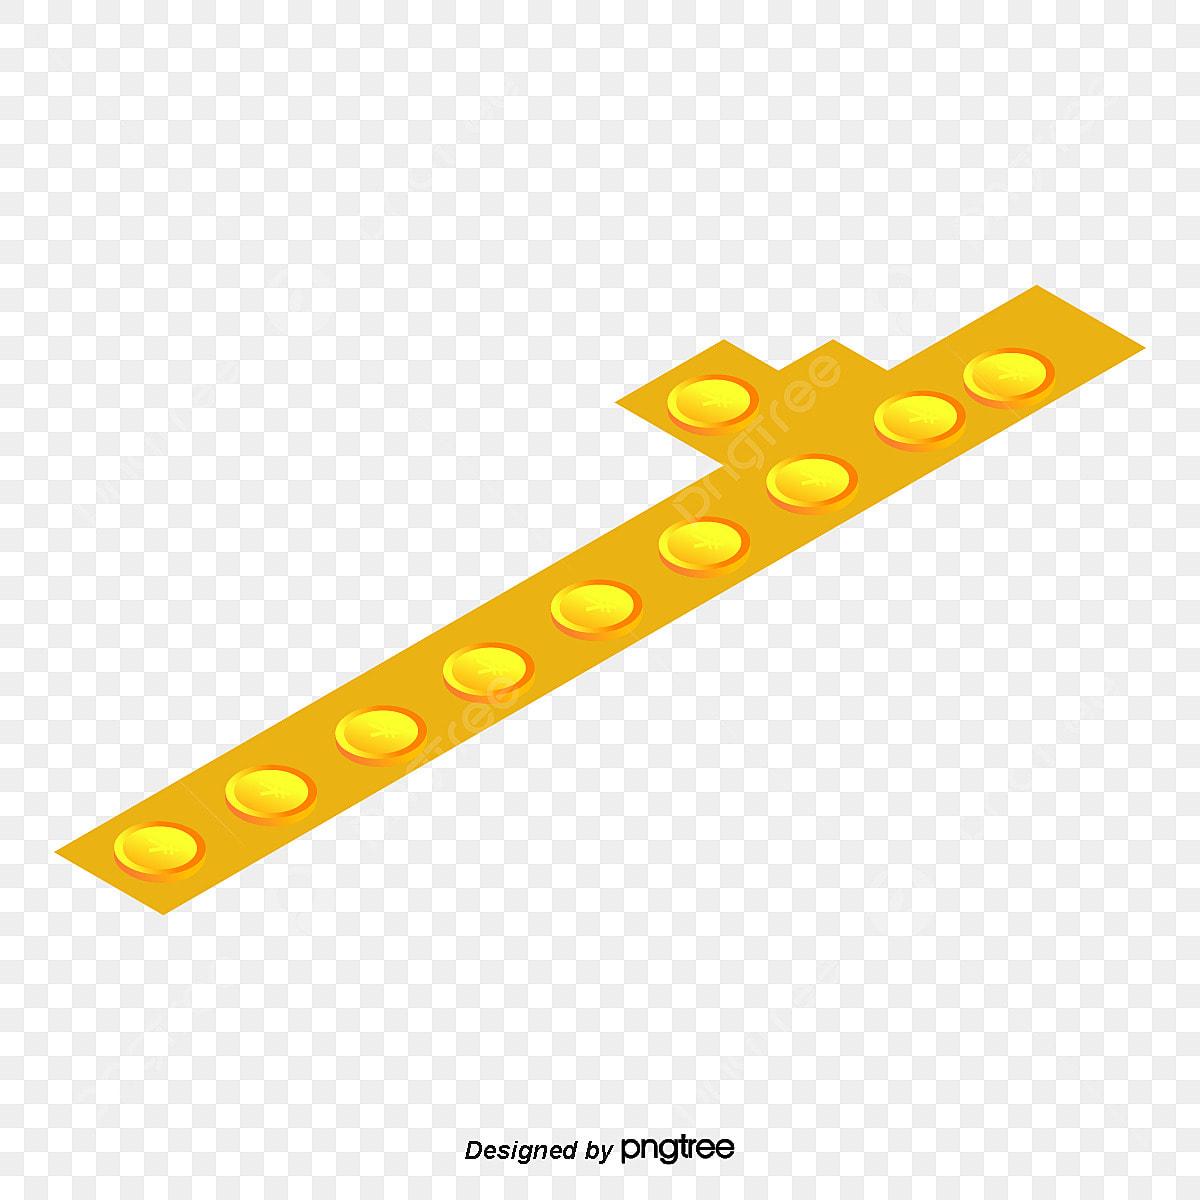 Award ribbon gold icon number first. design winner golden red medal 1  prize. symbol best trophy, 1st success champion, one